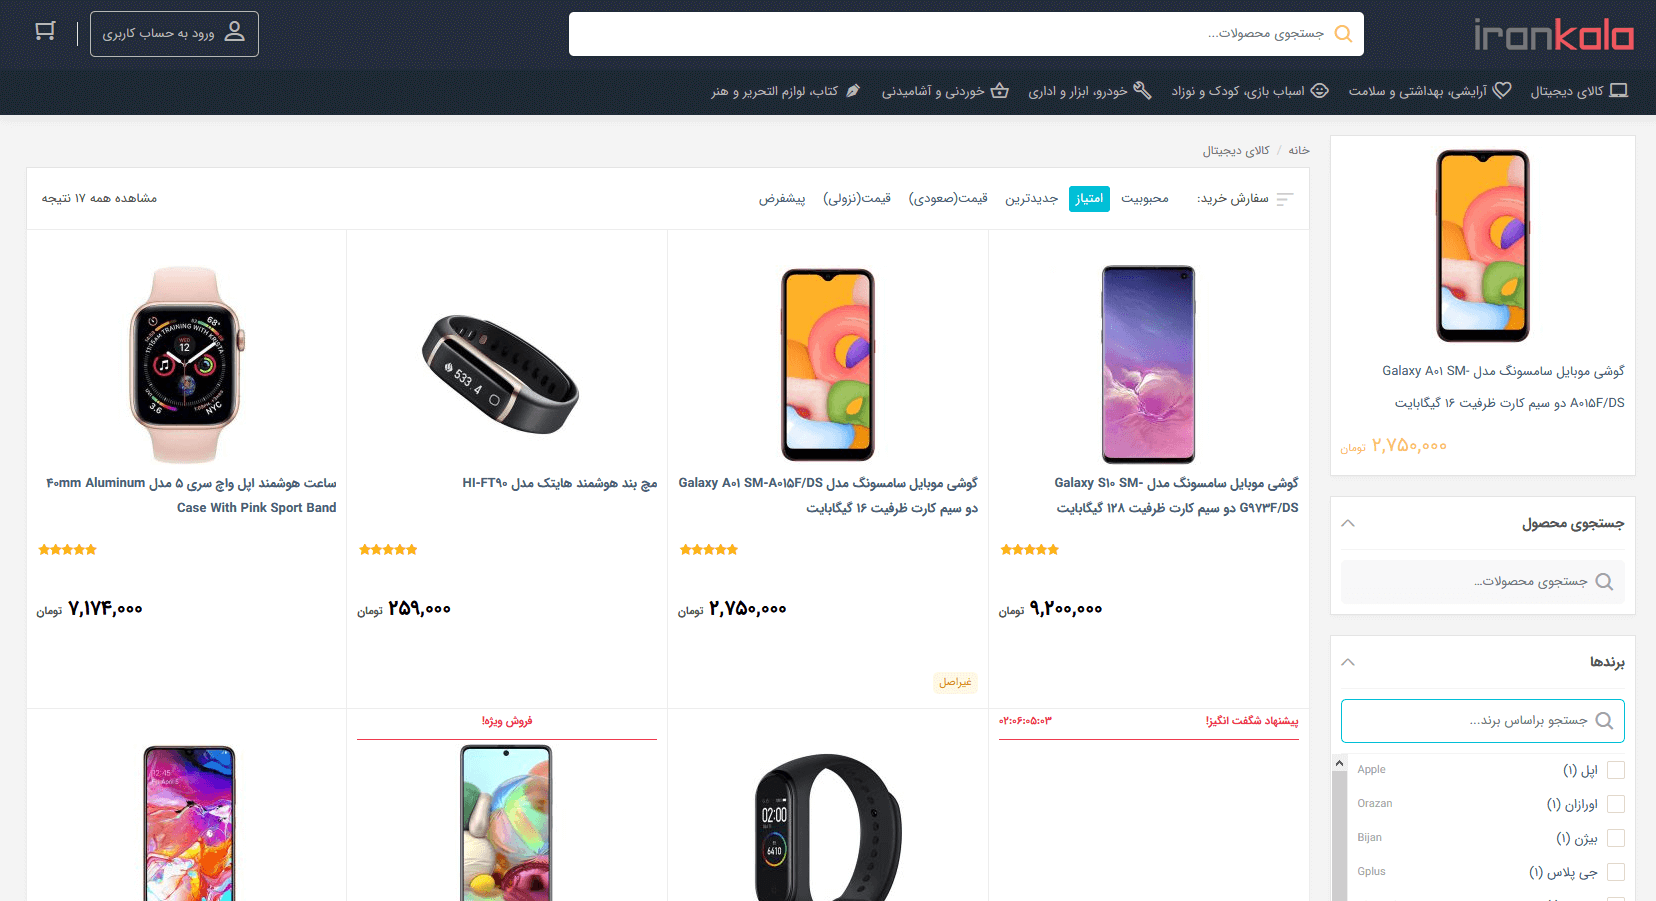 Screenshot_2020-08-22 کالای دیجیتال – فروشگاه اینترنتی ایرانکالا(1)